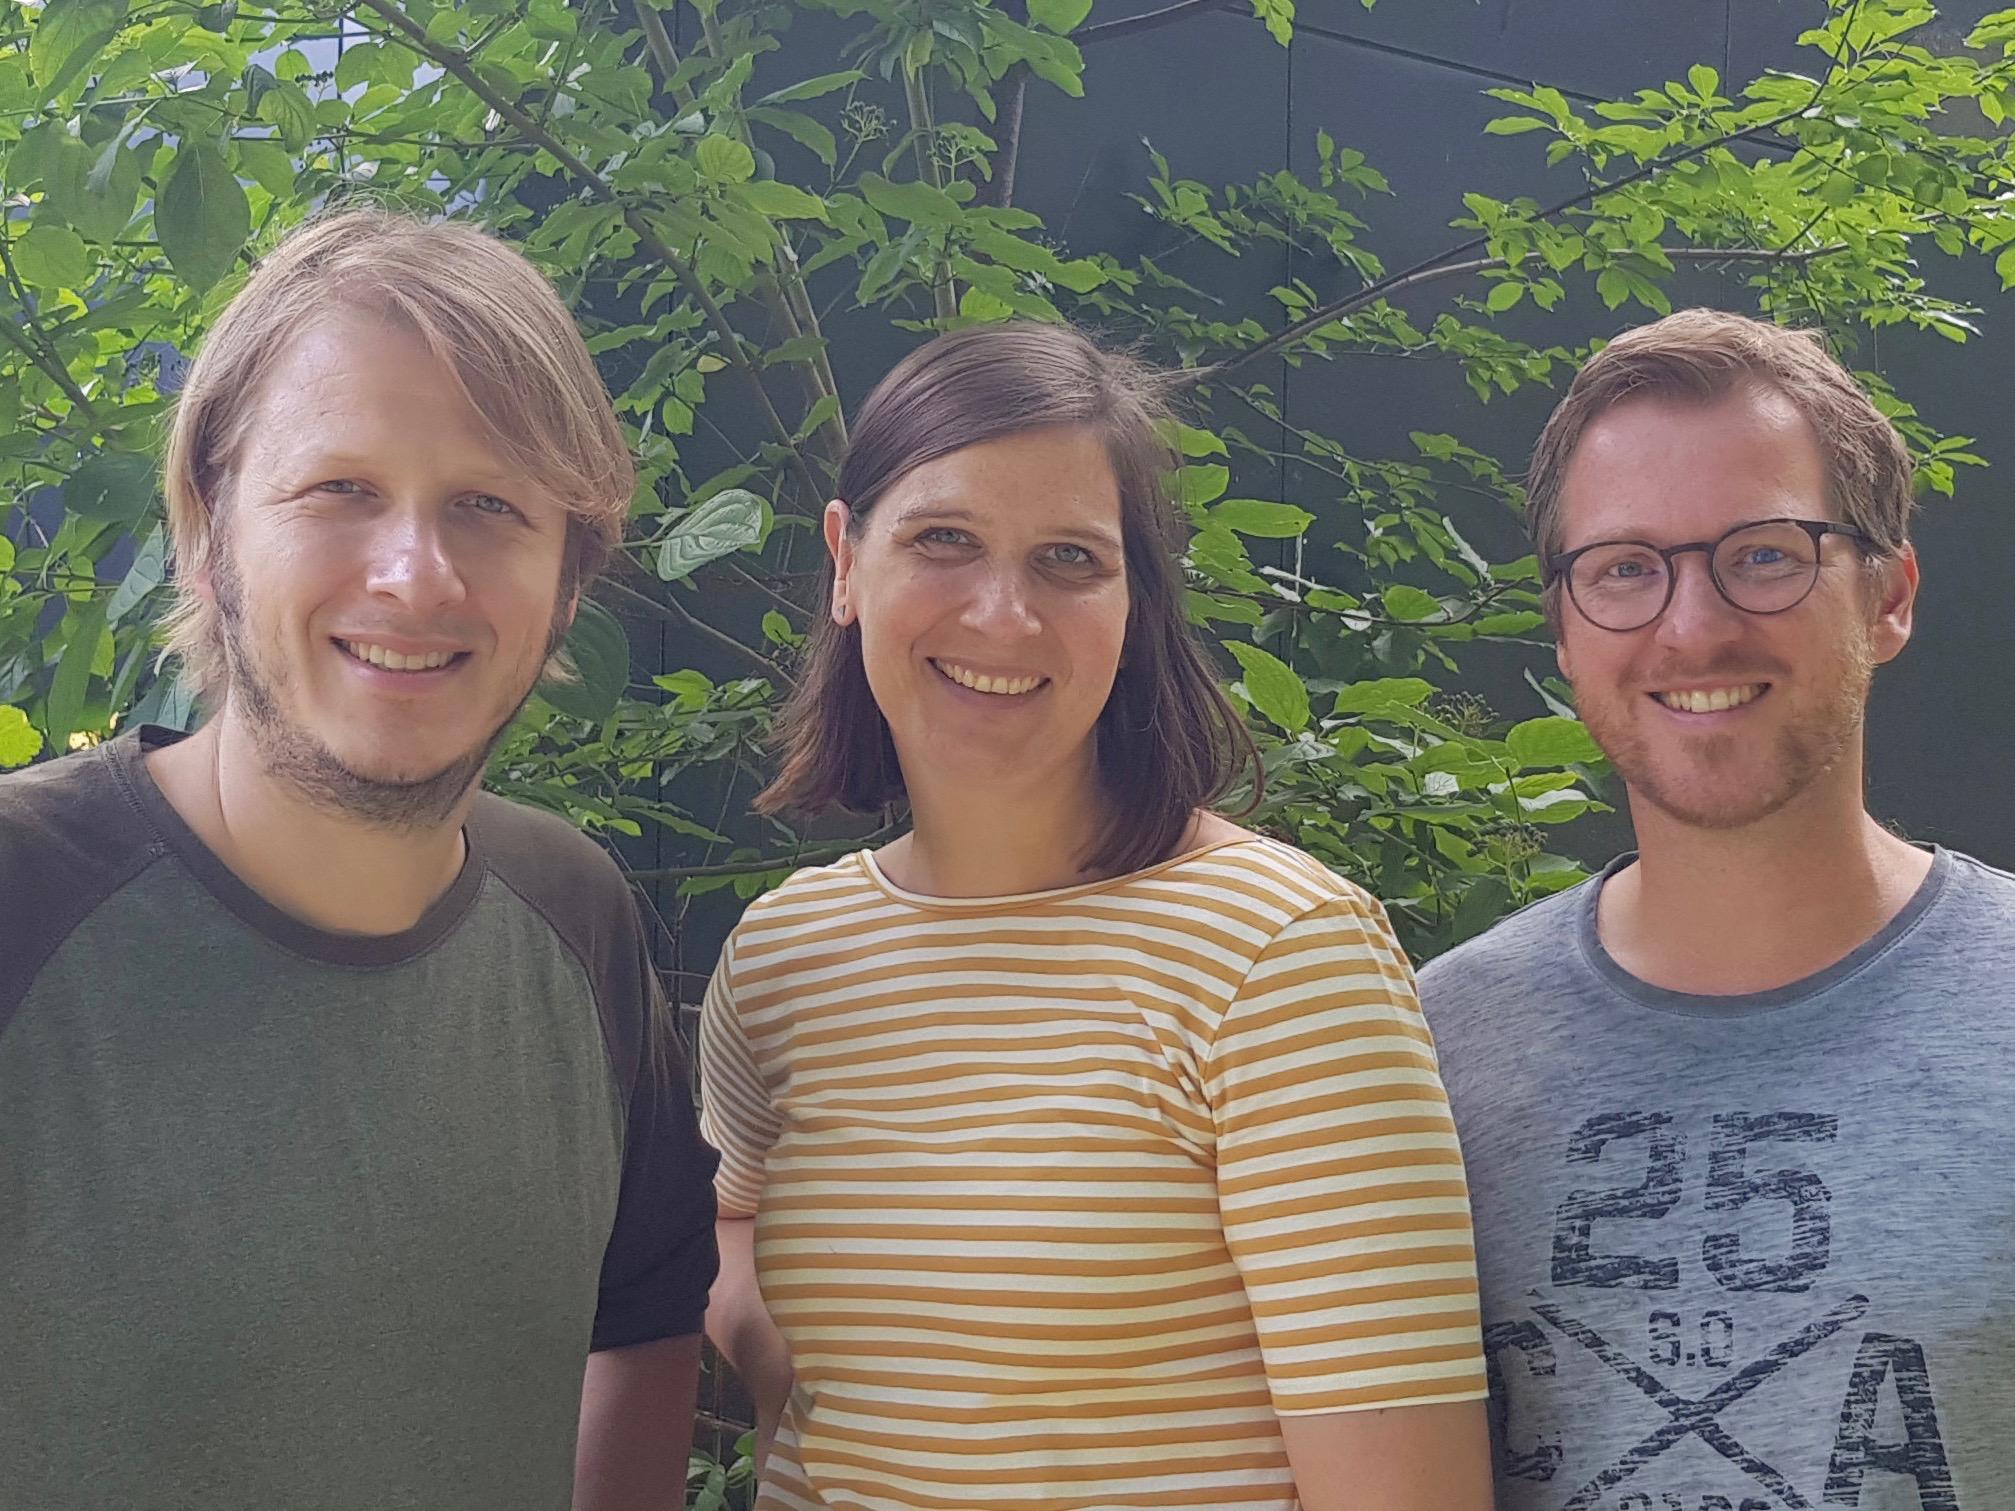 Patrick Rodeck, Kirsten Haltermann, Andreas Langehaneberg